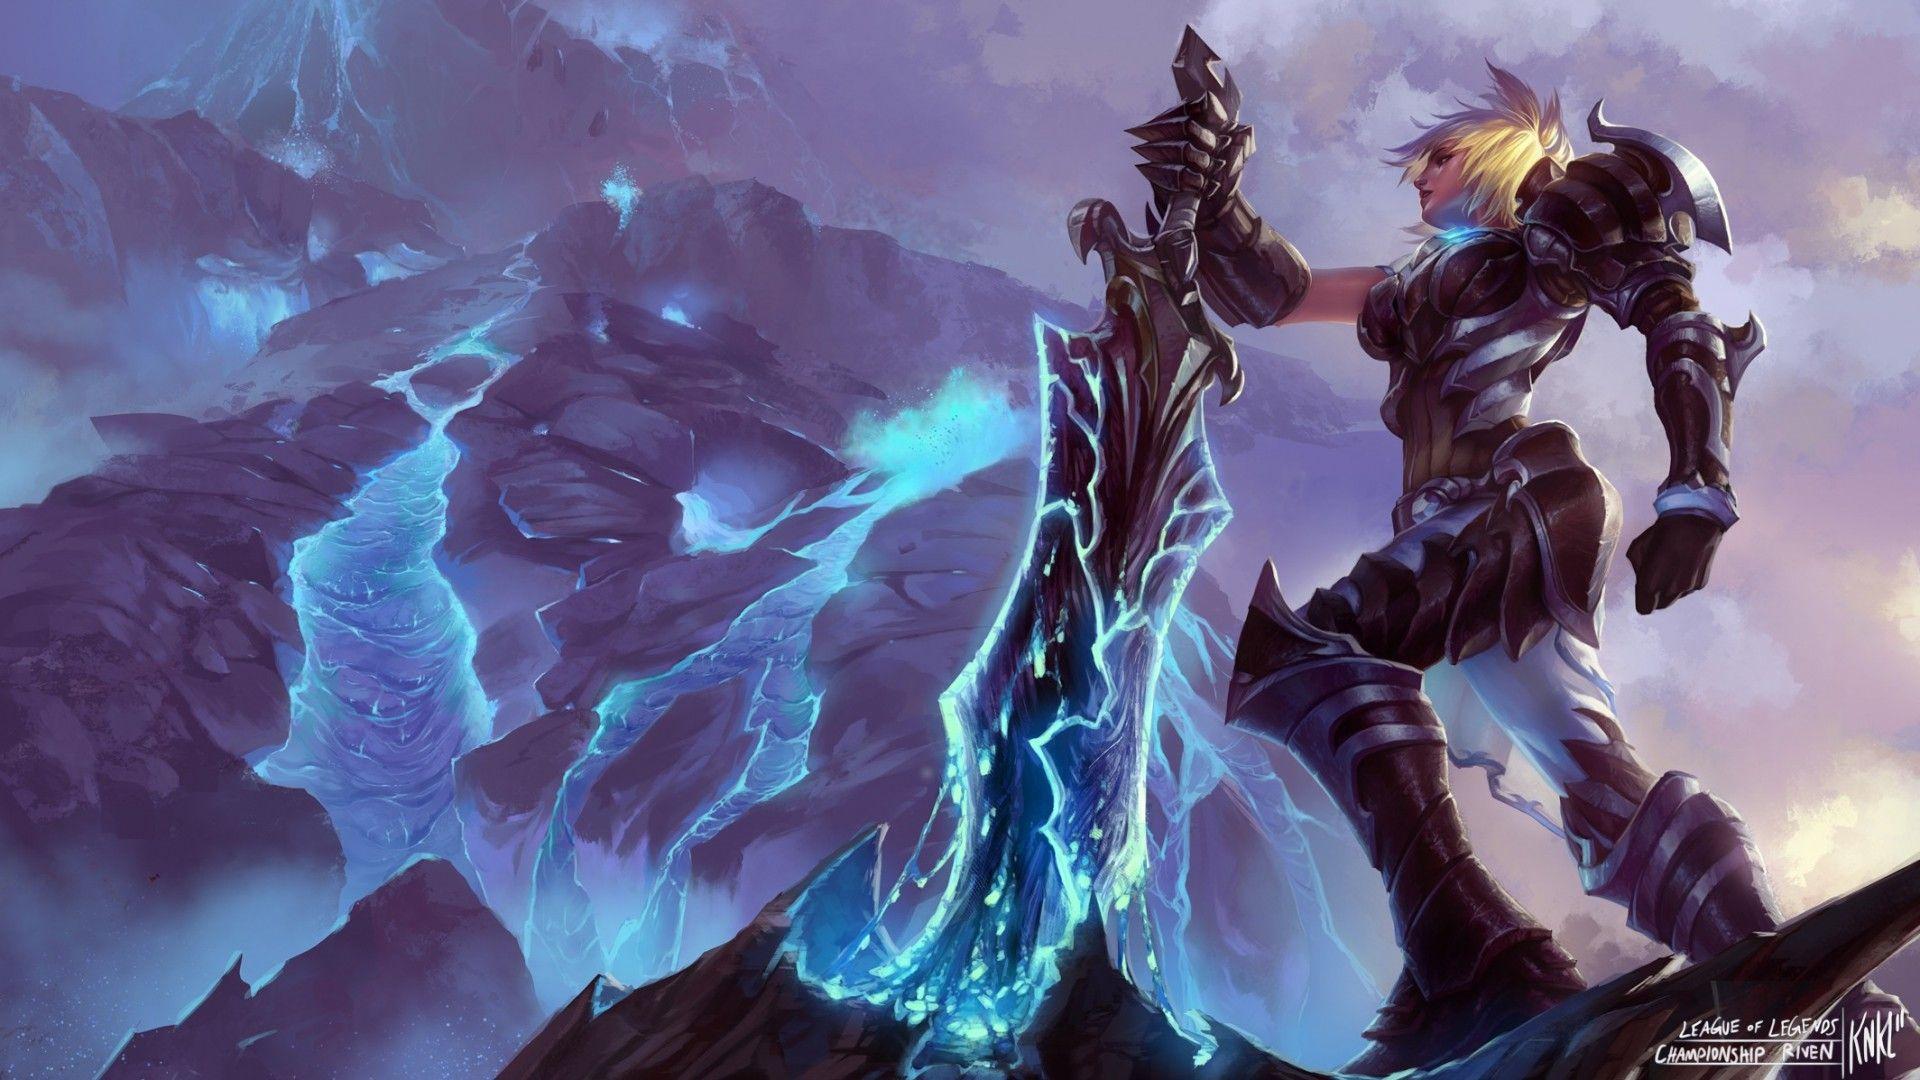 Championship Riven Wallpaper League Of Legends Play League Of Legends Lol League Of Legends